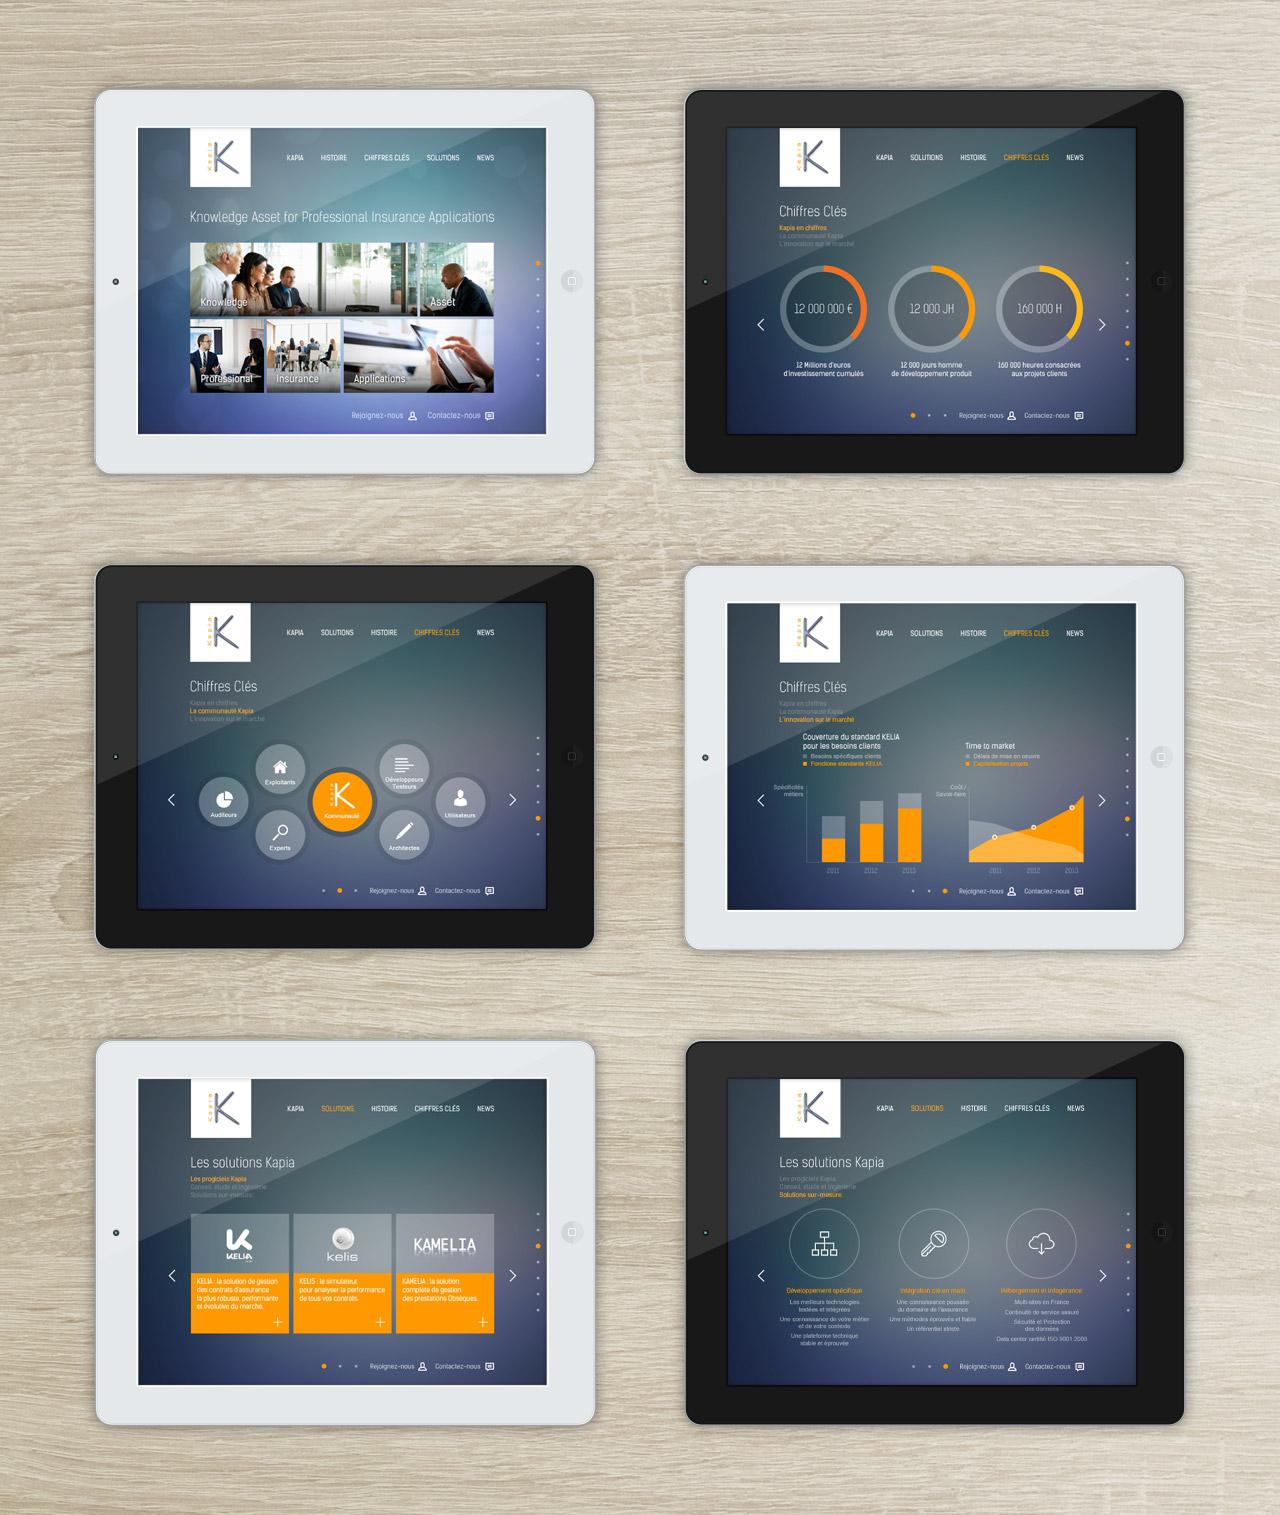 kapia-solutions-site-tablette-responsive-design-creation-communication-caconcept-alexis-cretin-graphiste